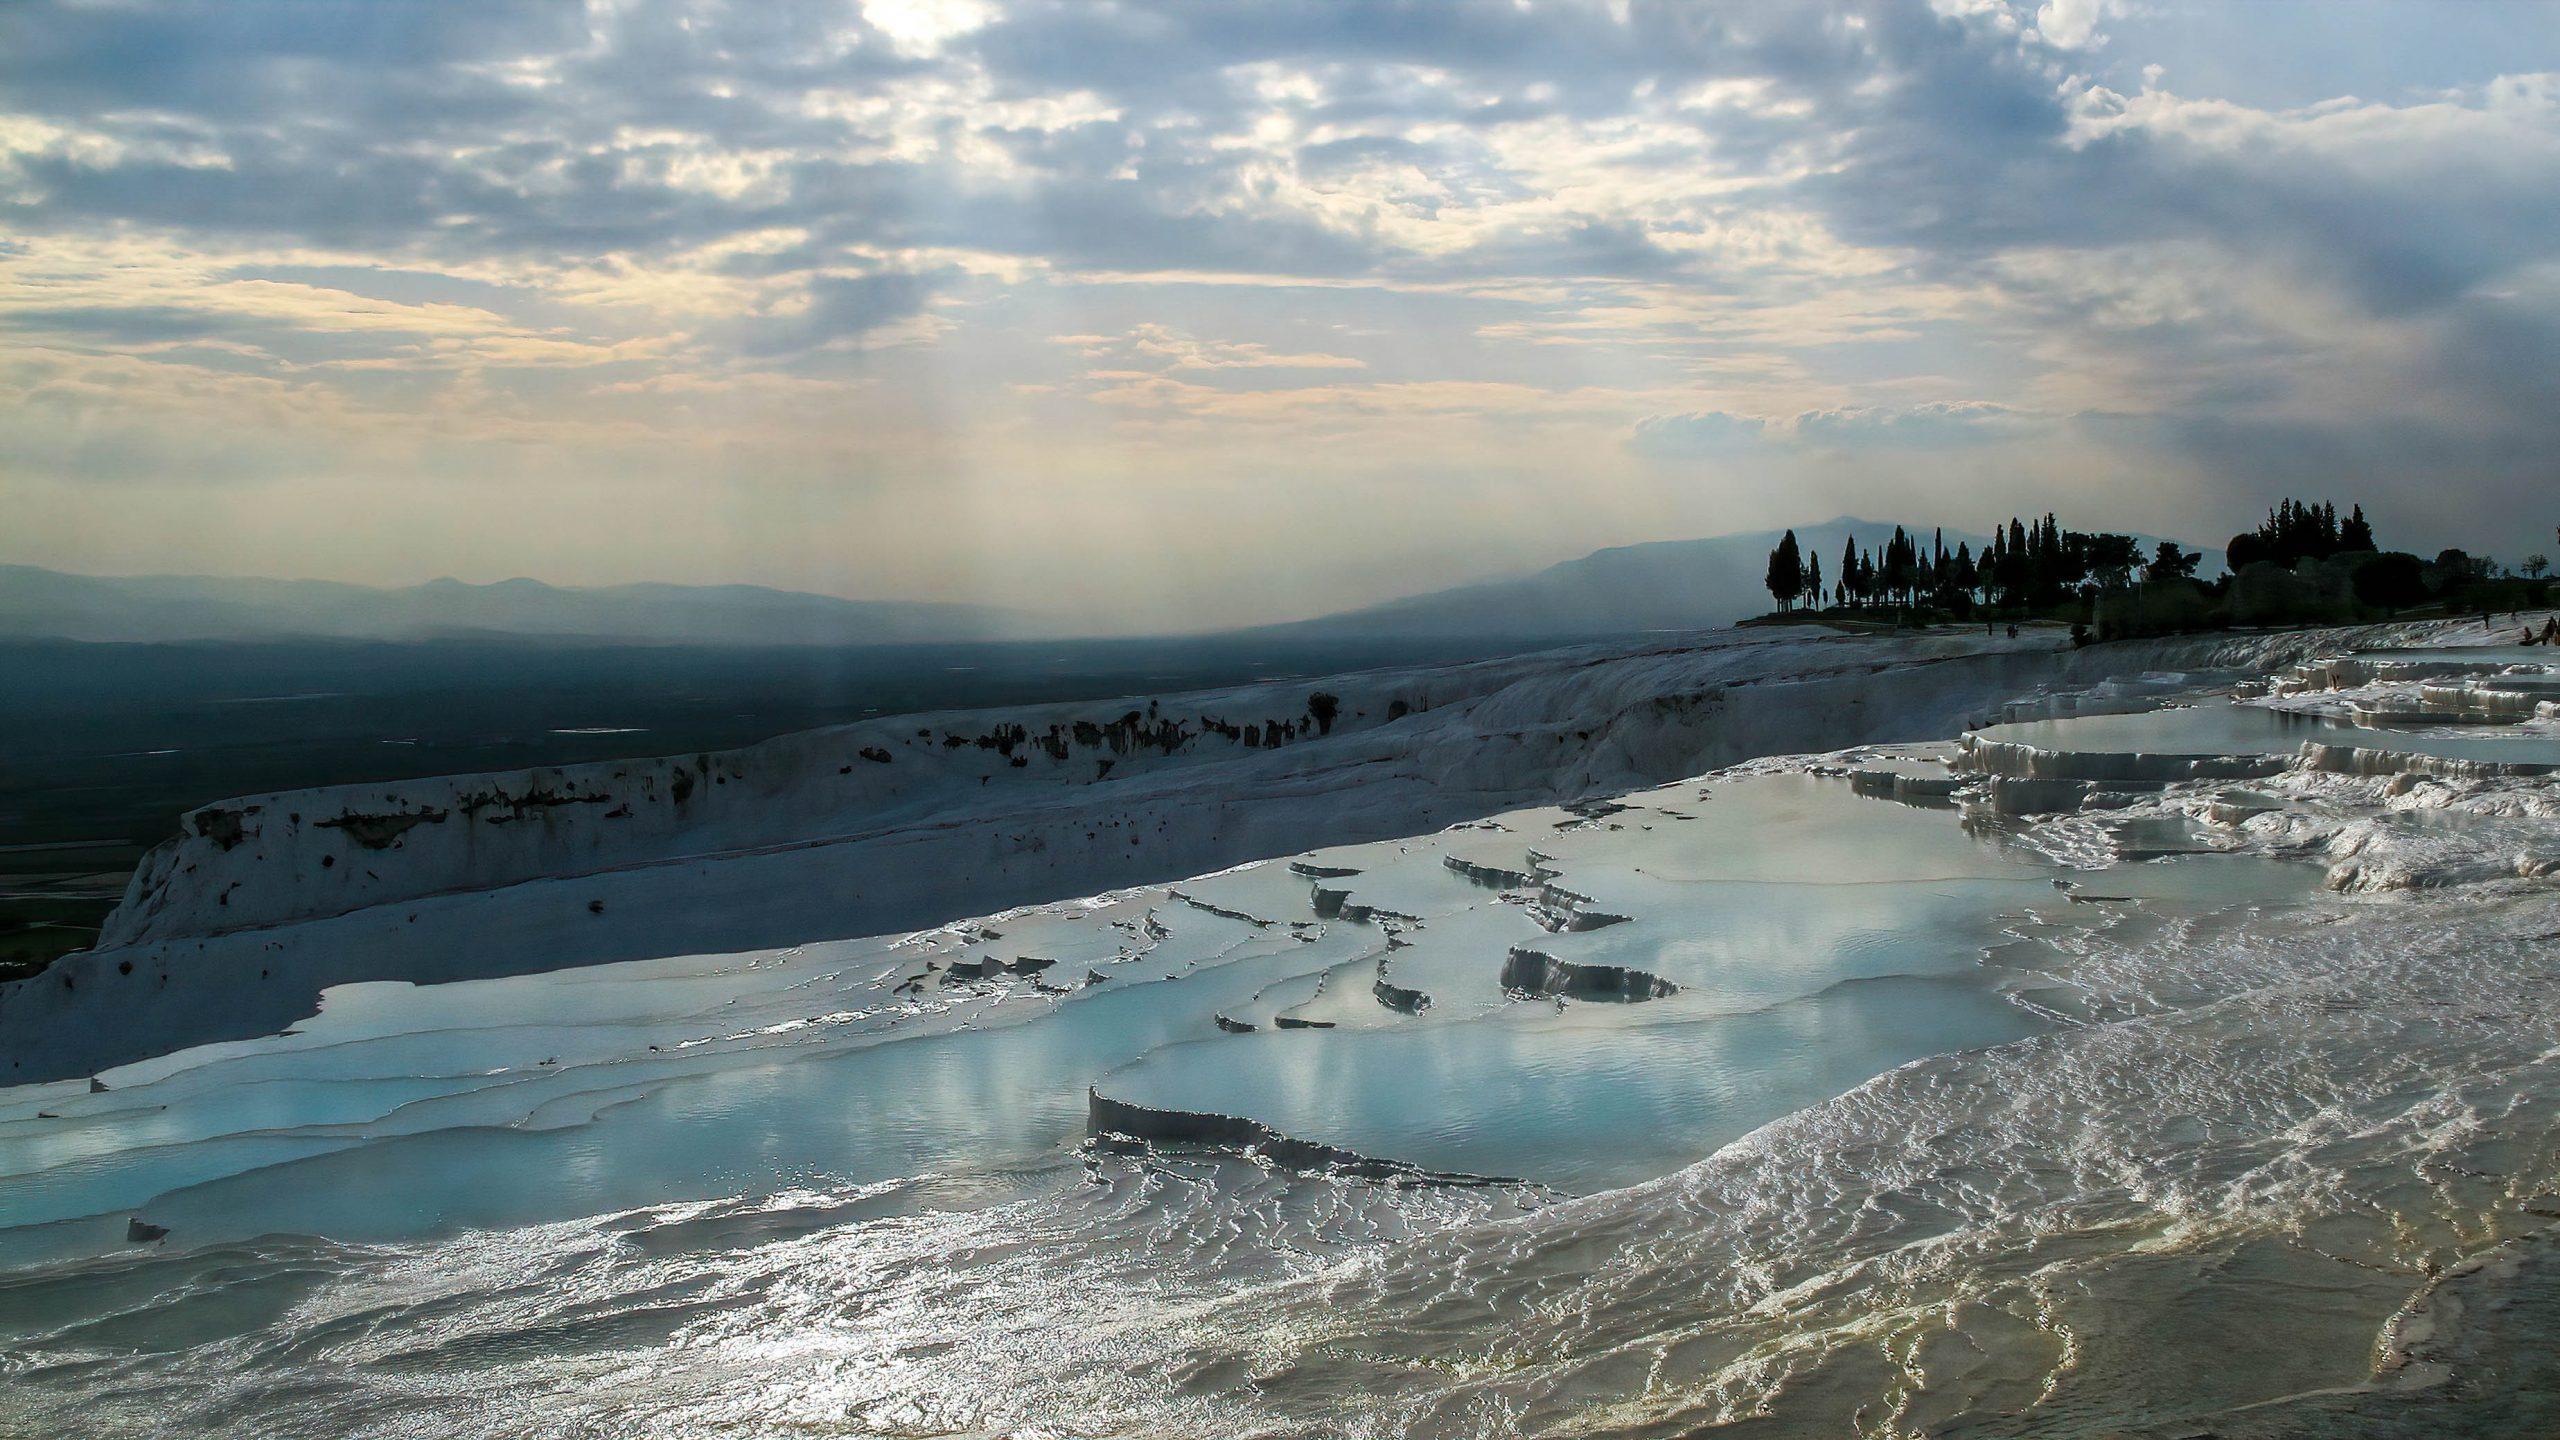 8 Days Istanbul, Cappadocia, Konya, Pamukkale and Ephesus Tour